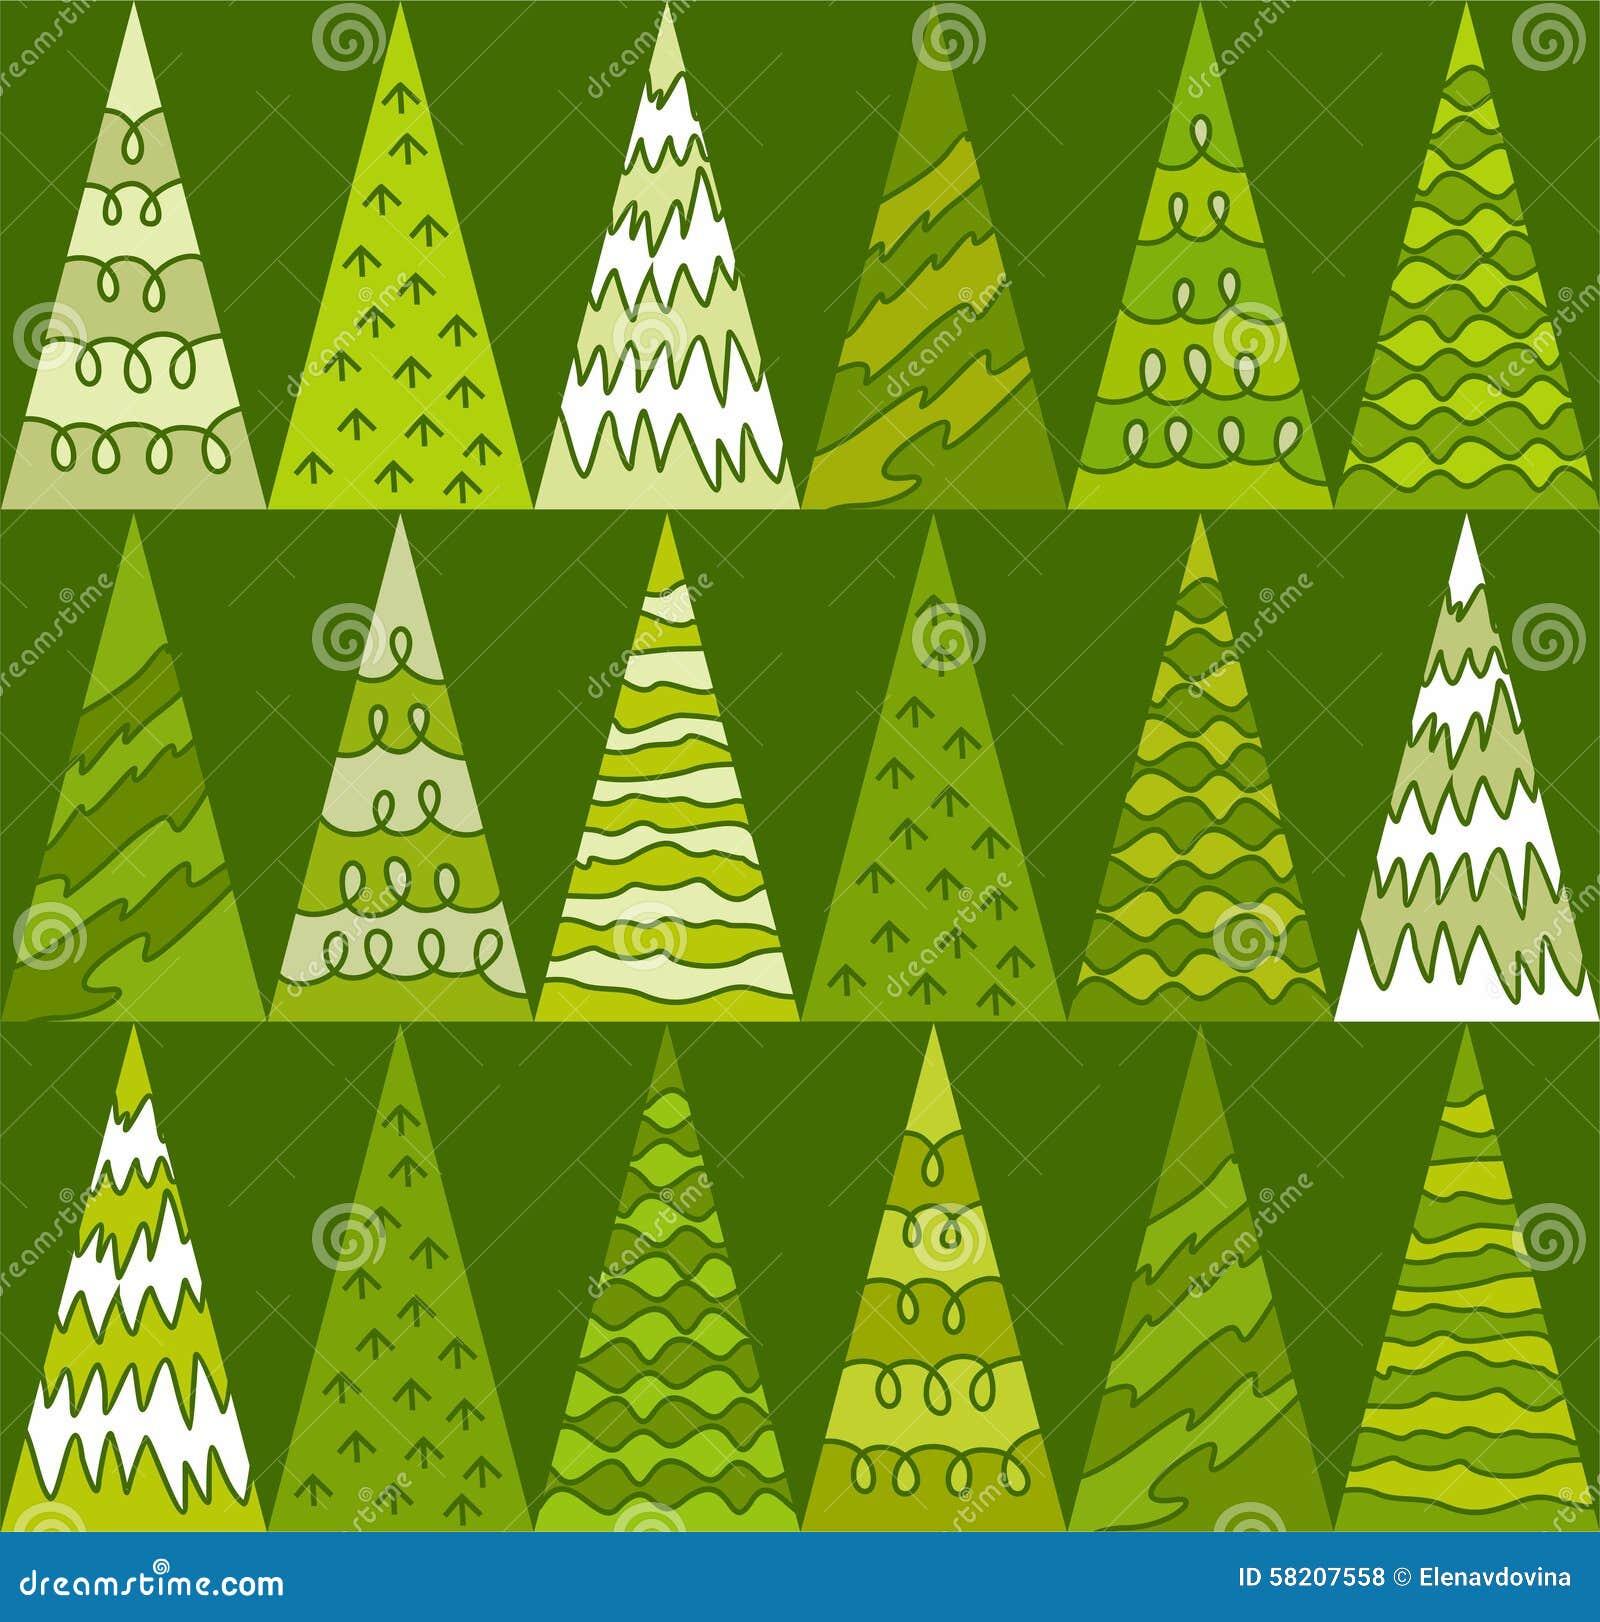 sapin arbres vert no l triangles fond g om trique et vert sans couture illustration de. Black Bedroom Furniture Sets. Home Design Ideas